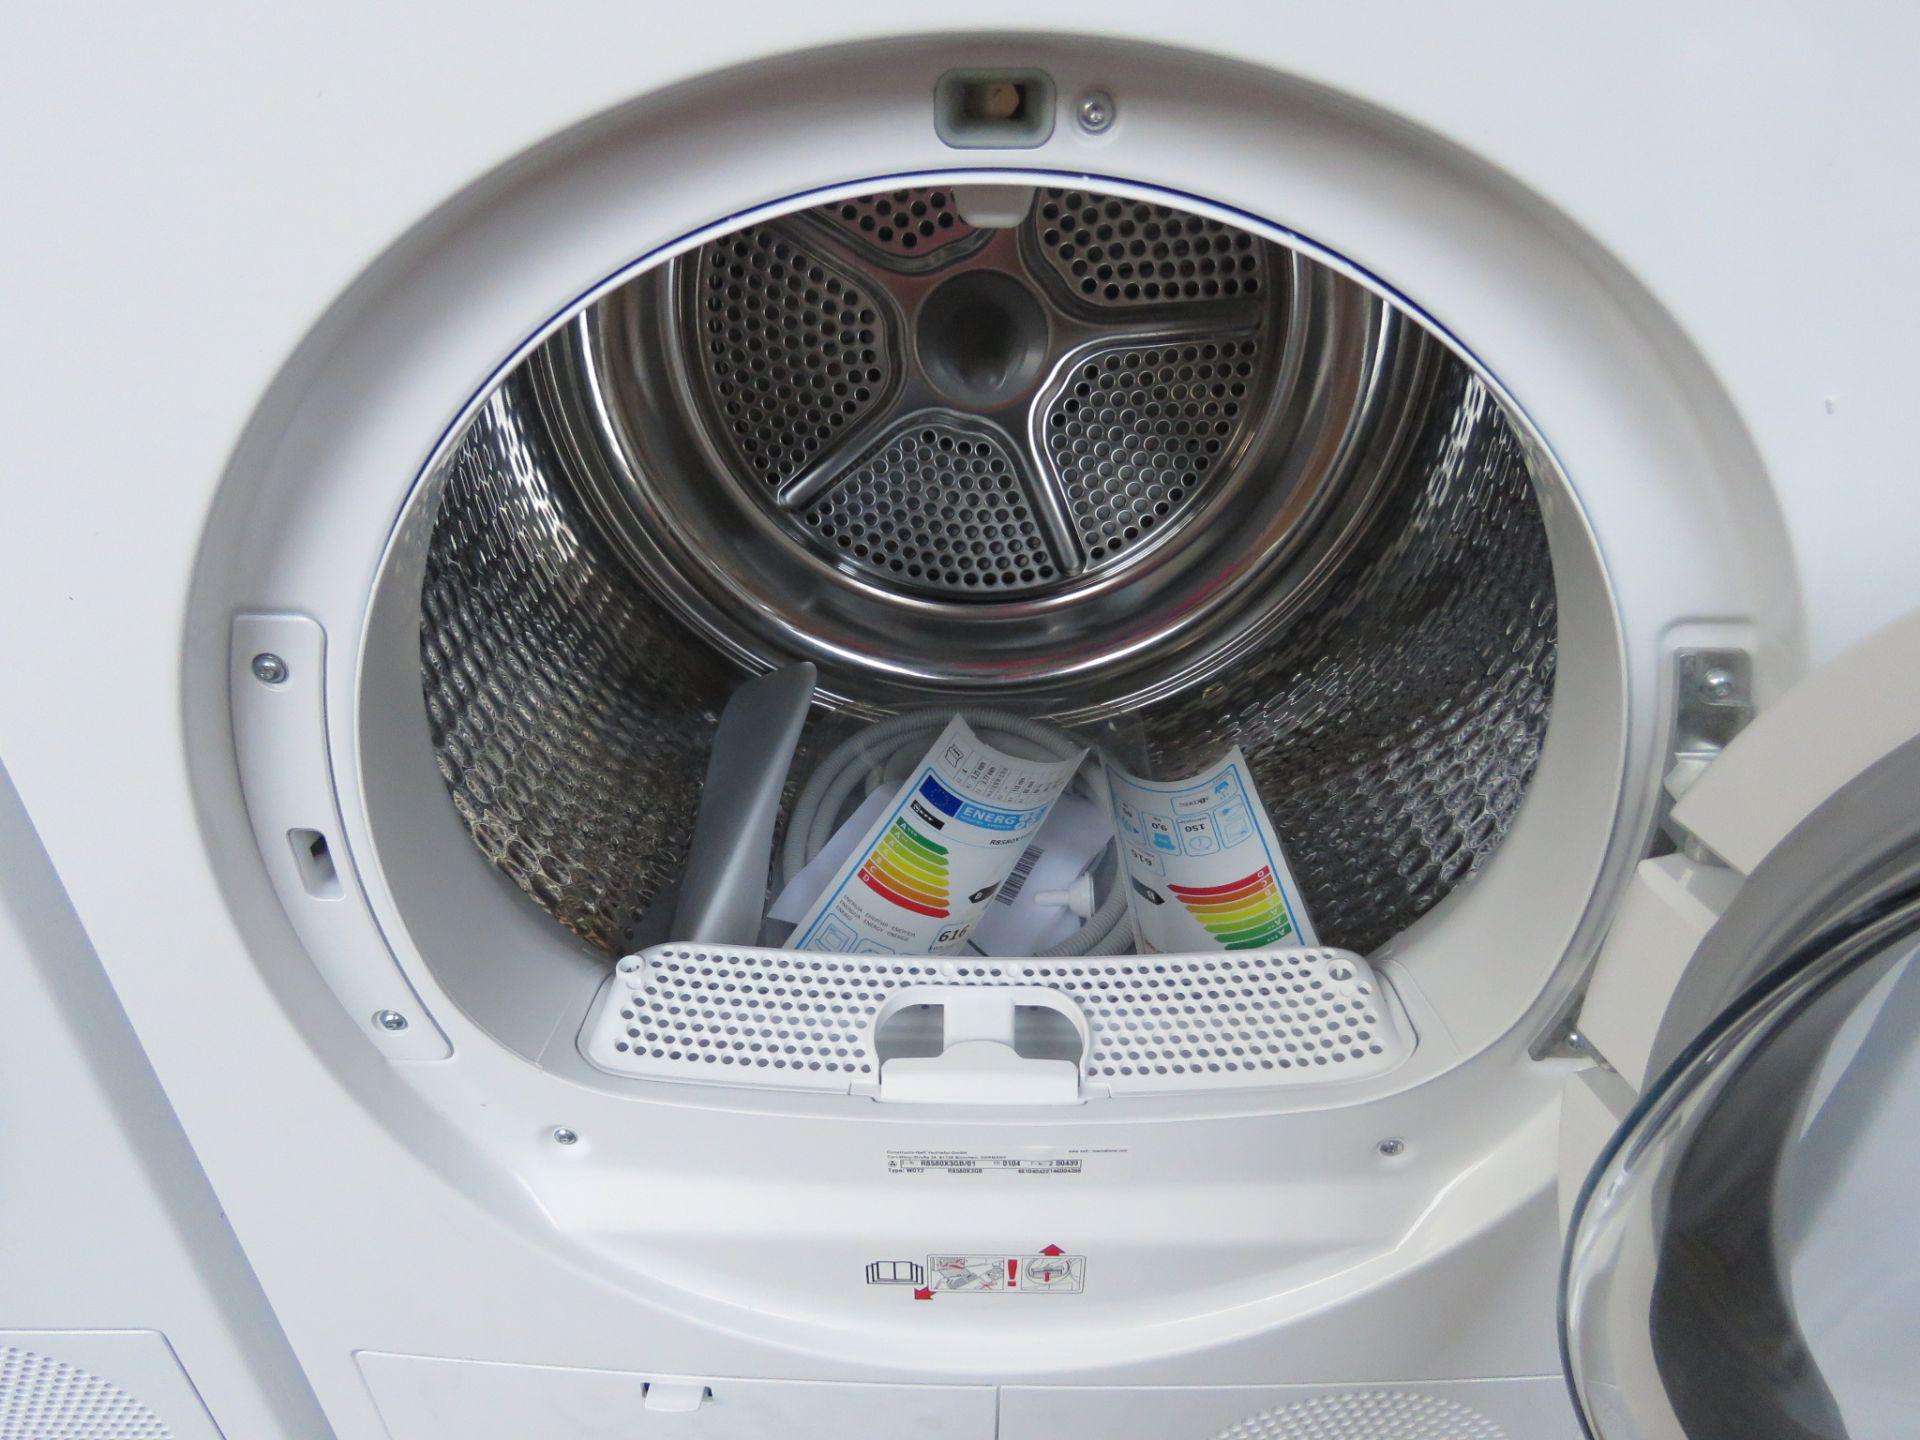 R8580X3GB-B Neff Tumble dryer - Image 2 of 2